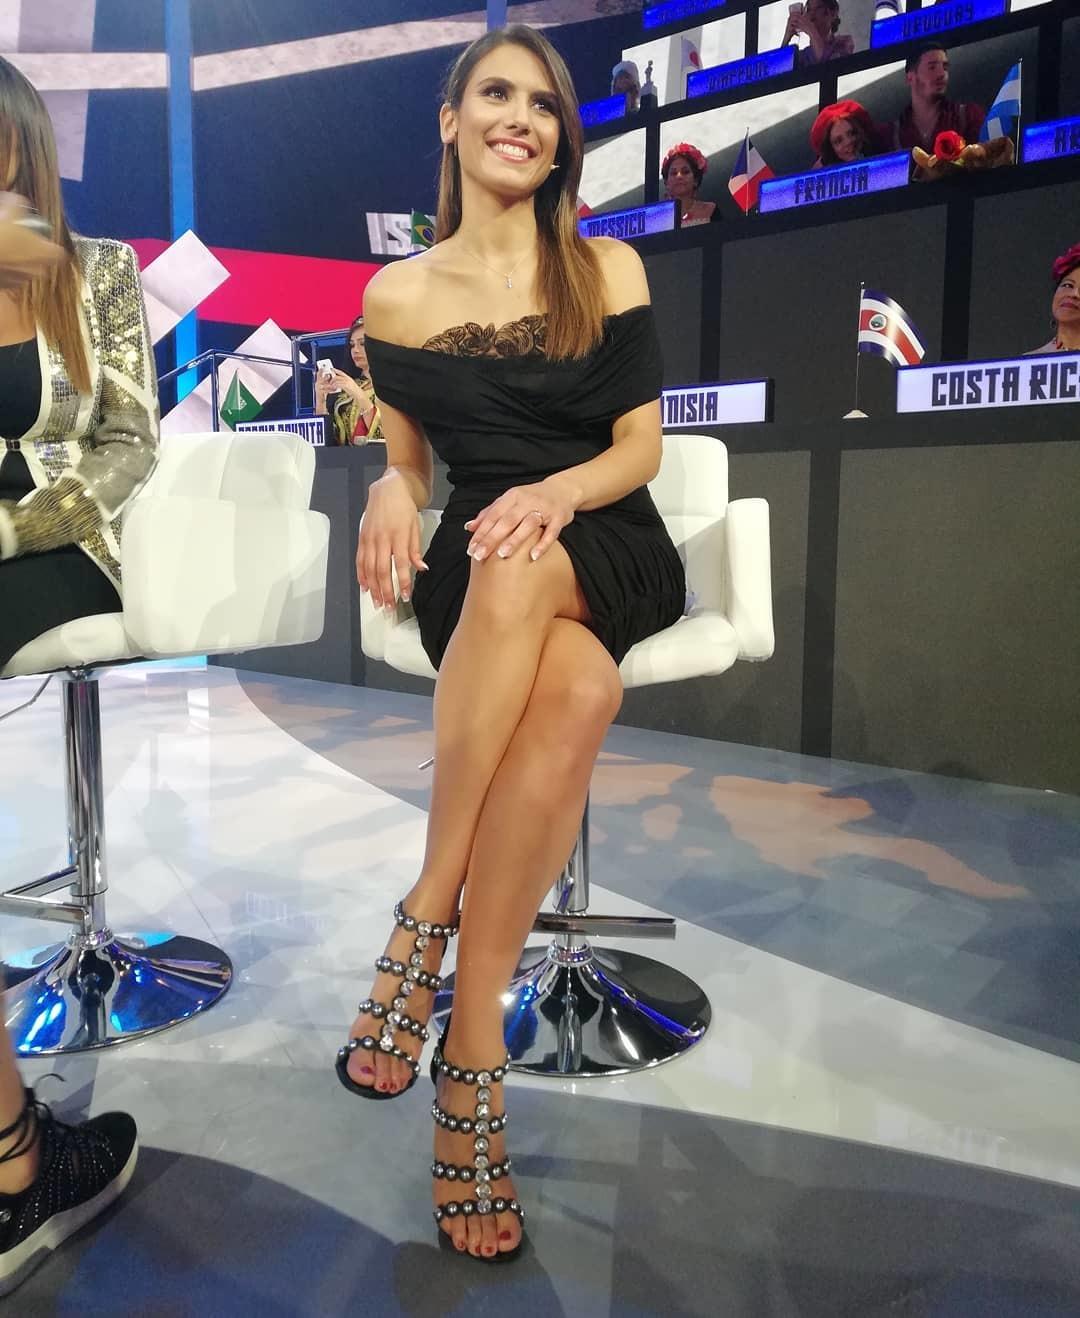 Feet diletta leotta naked (59 photos), Pussy, Fappening, Selfie, braless 2018